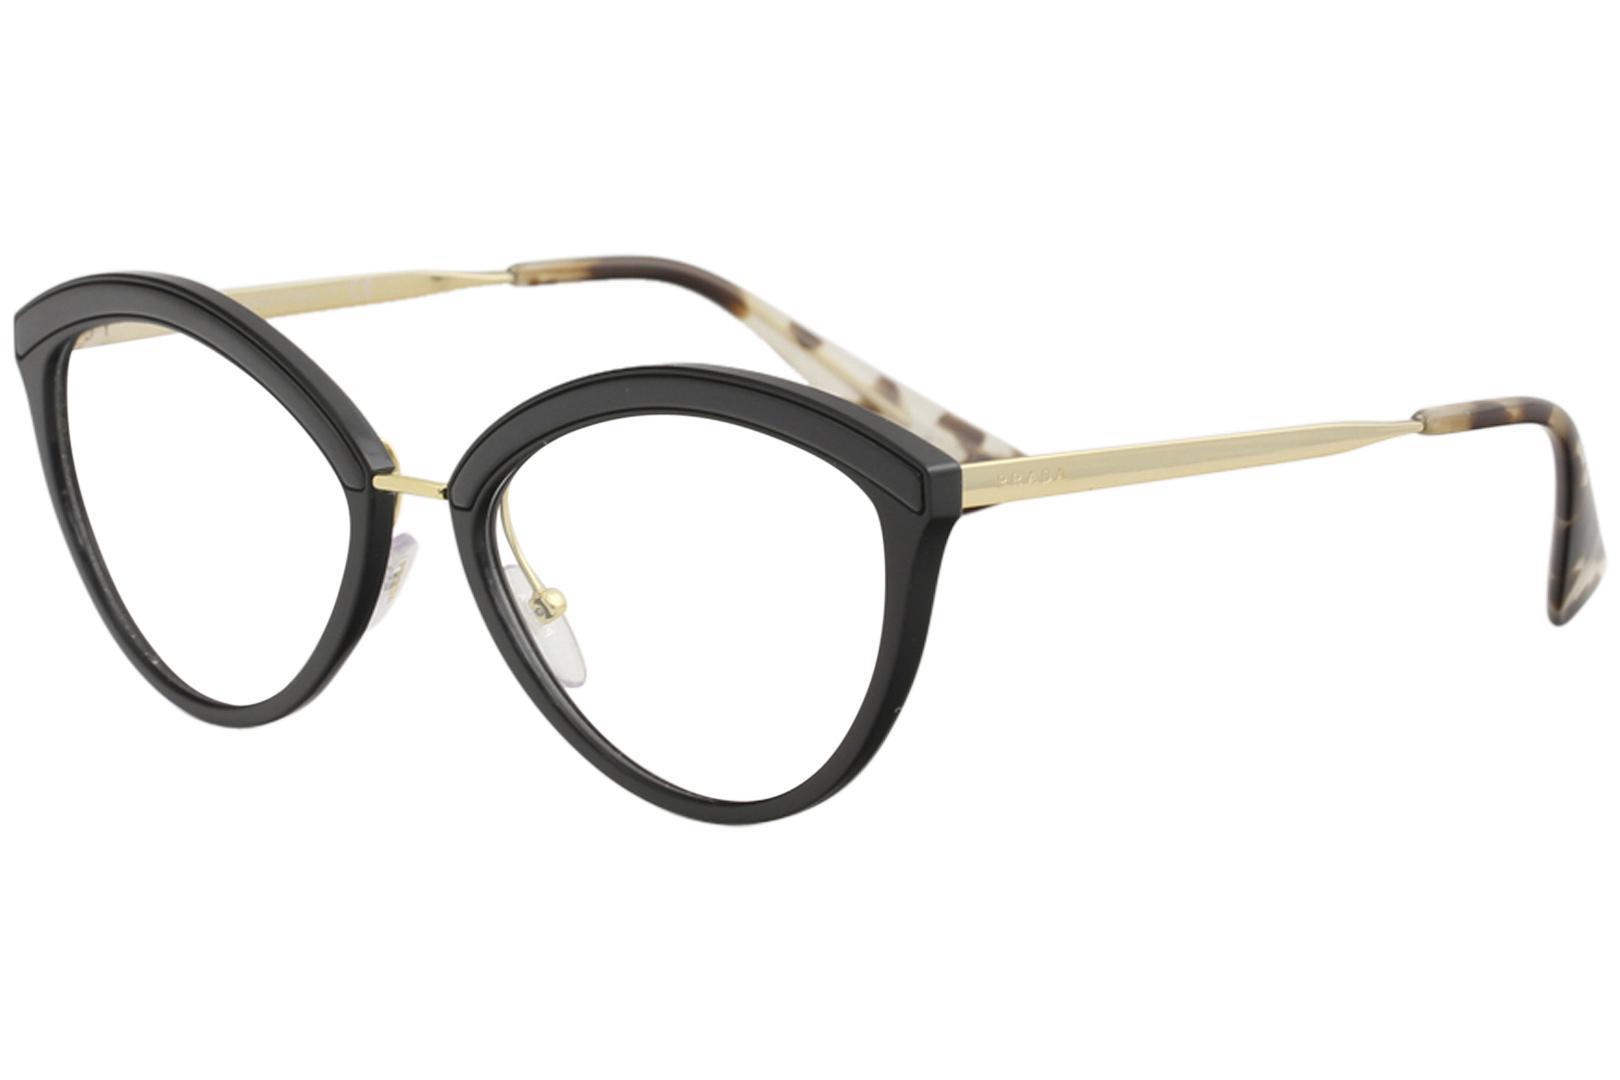 9dbbad4f061 Prada Women s Eyeglasses VPR14U VPR 14U Full Rim Optical Frame